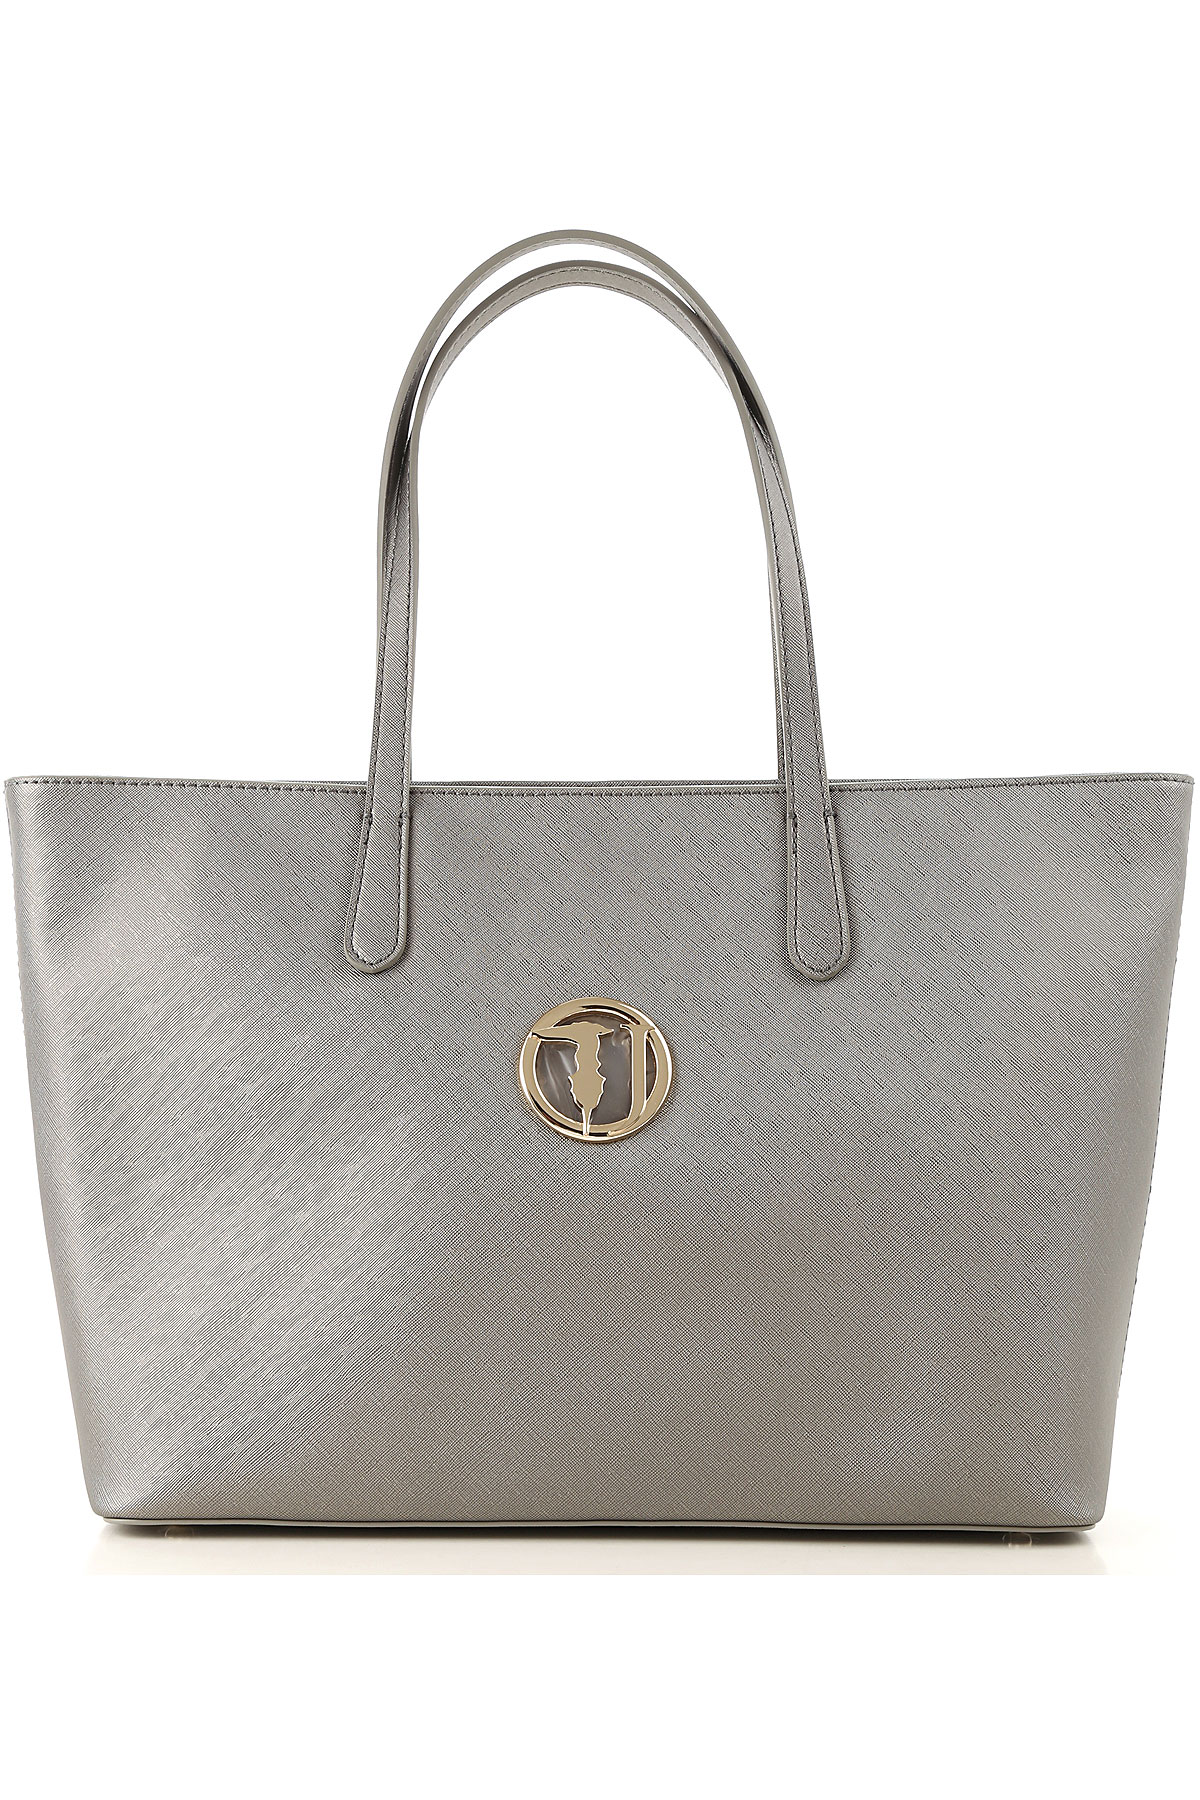 Trussardi Tote Bag On Sale, Gunmetal, Eco Leather, 2019